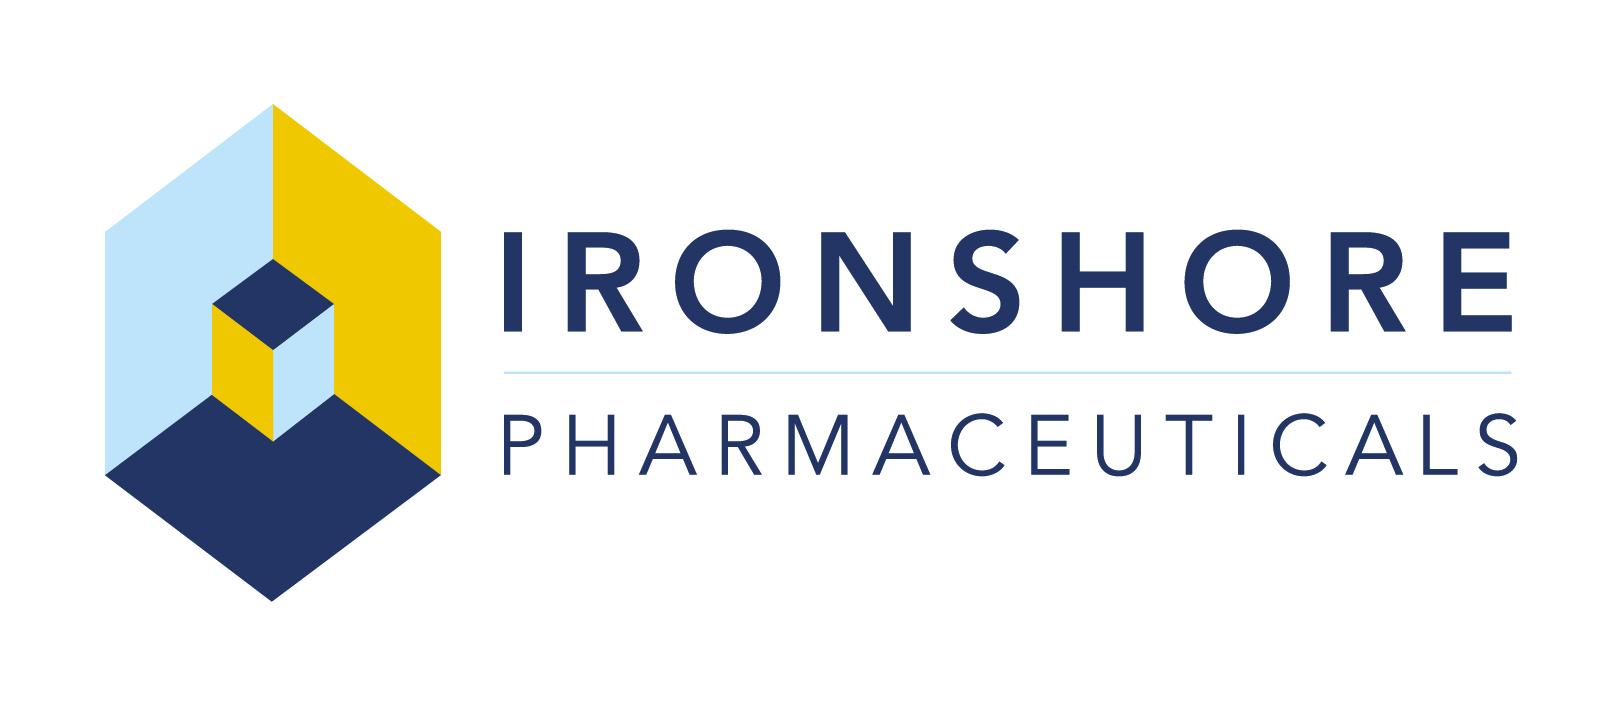 ironshore-pharmaceuticals-print-CMYK